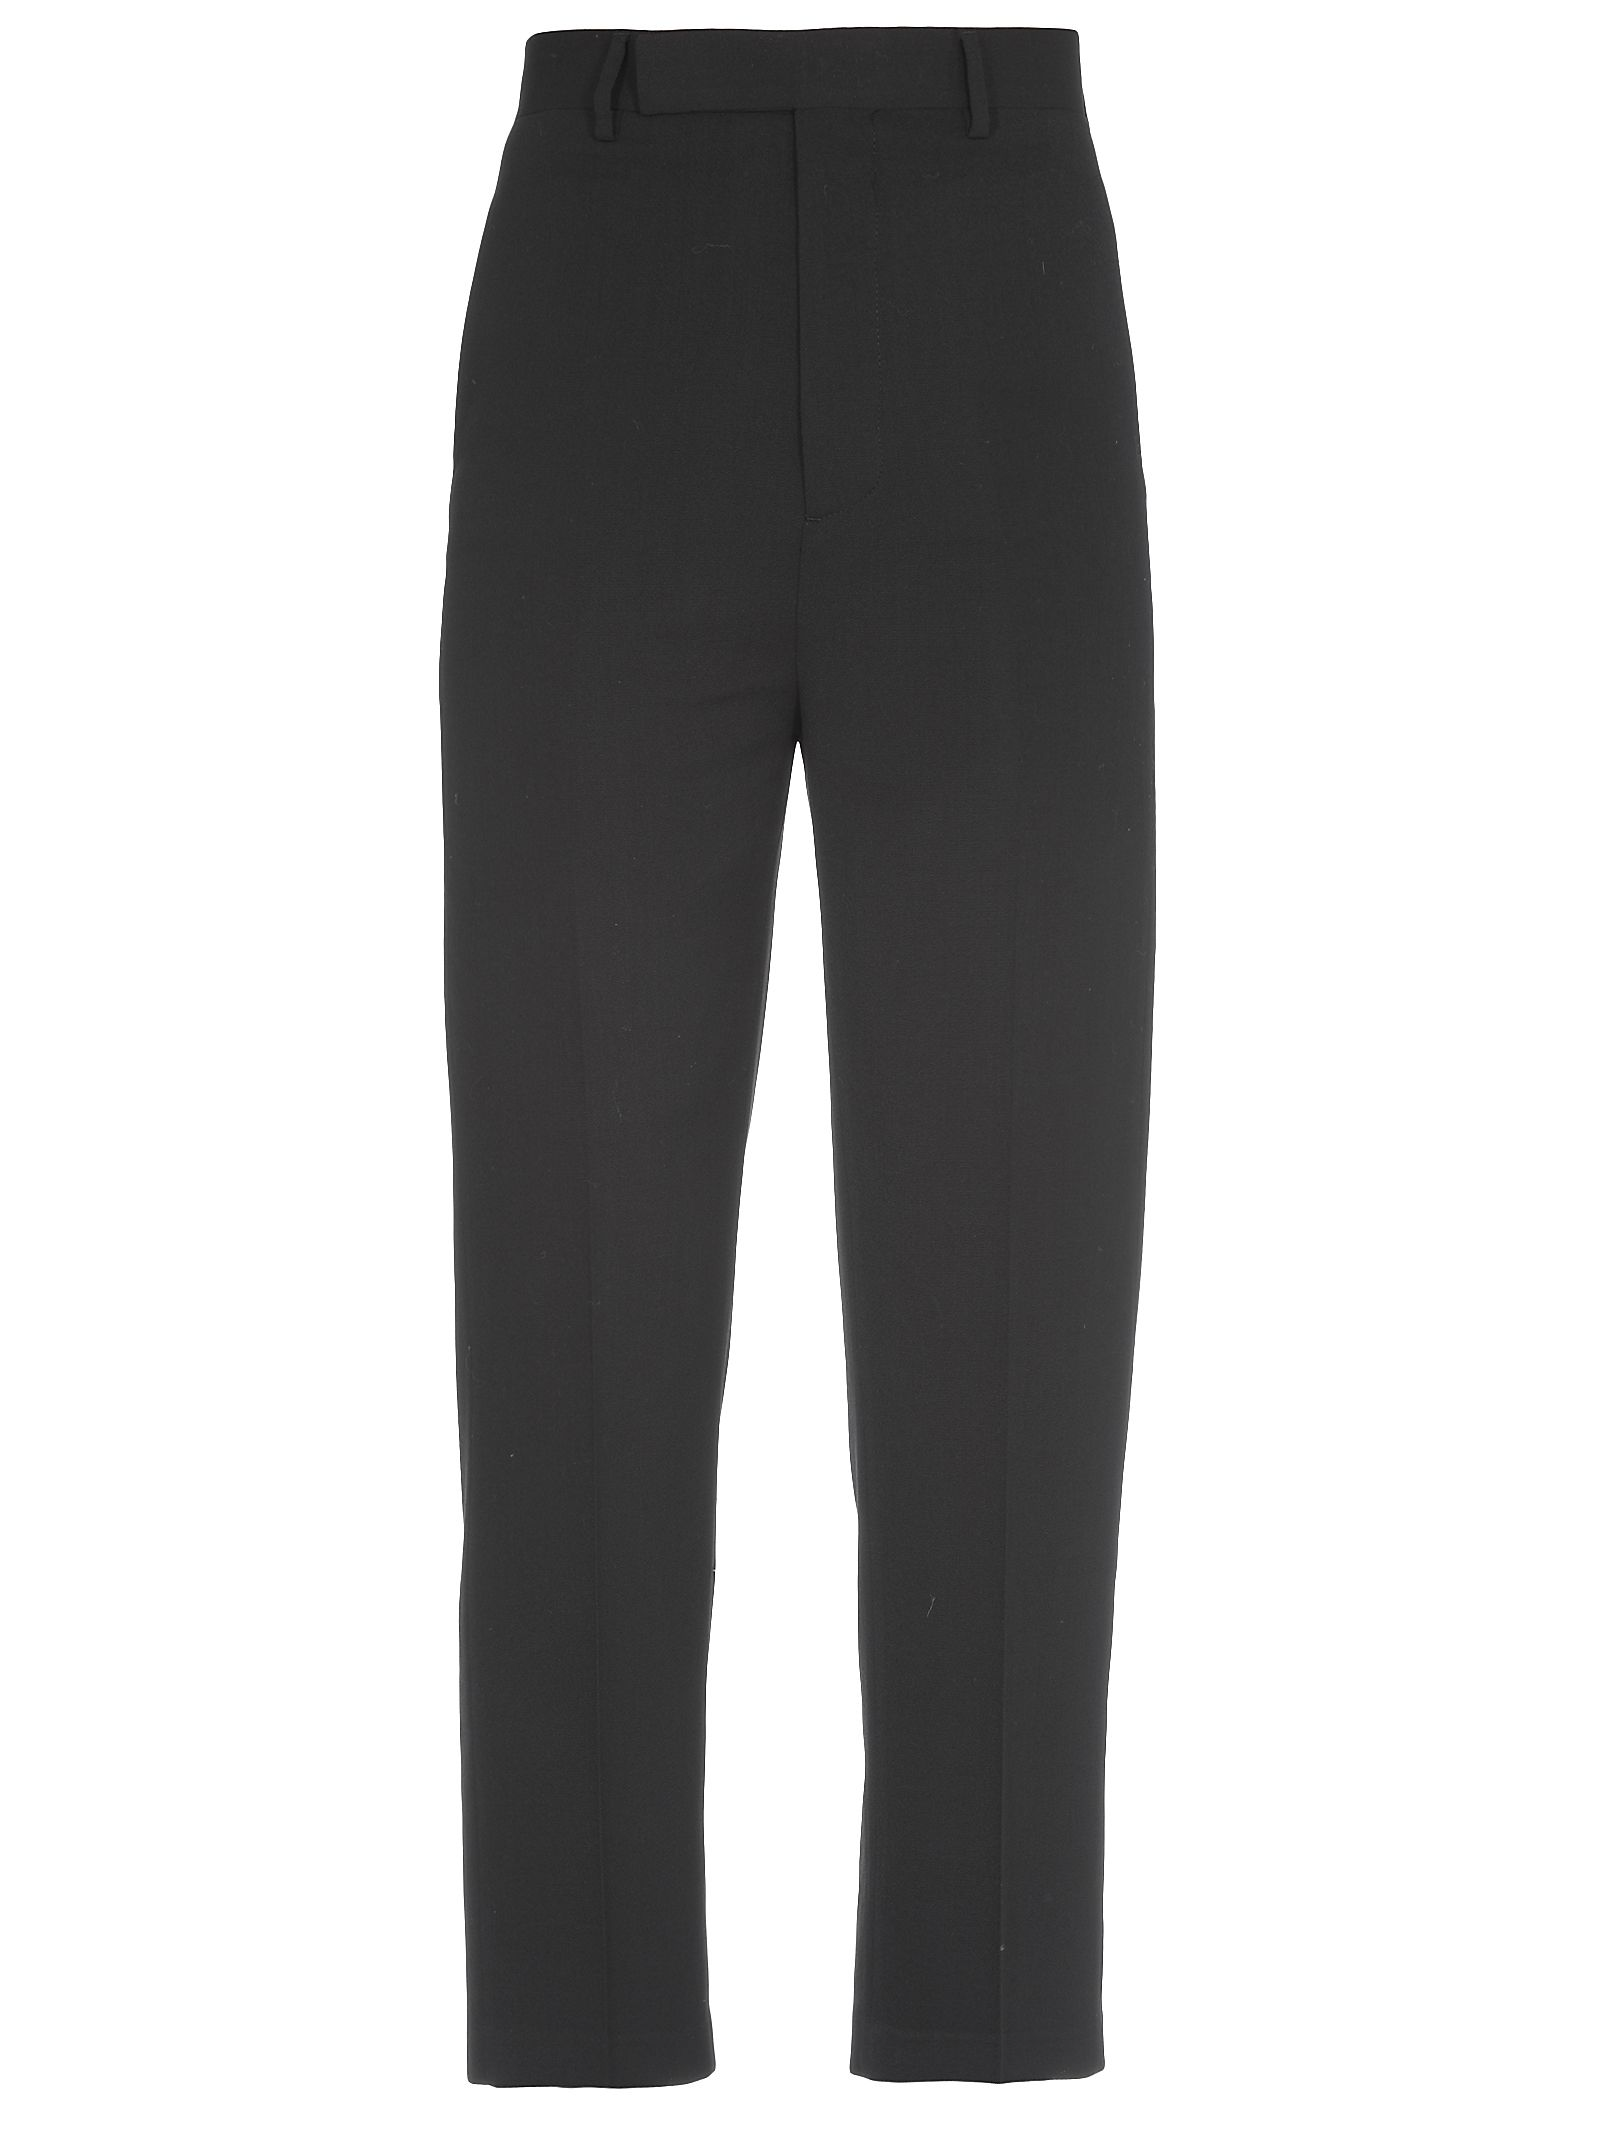 Rick Owens Wool Trousers